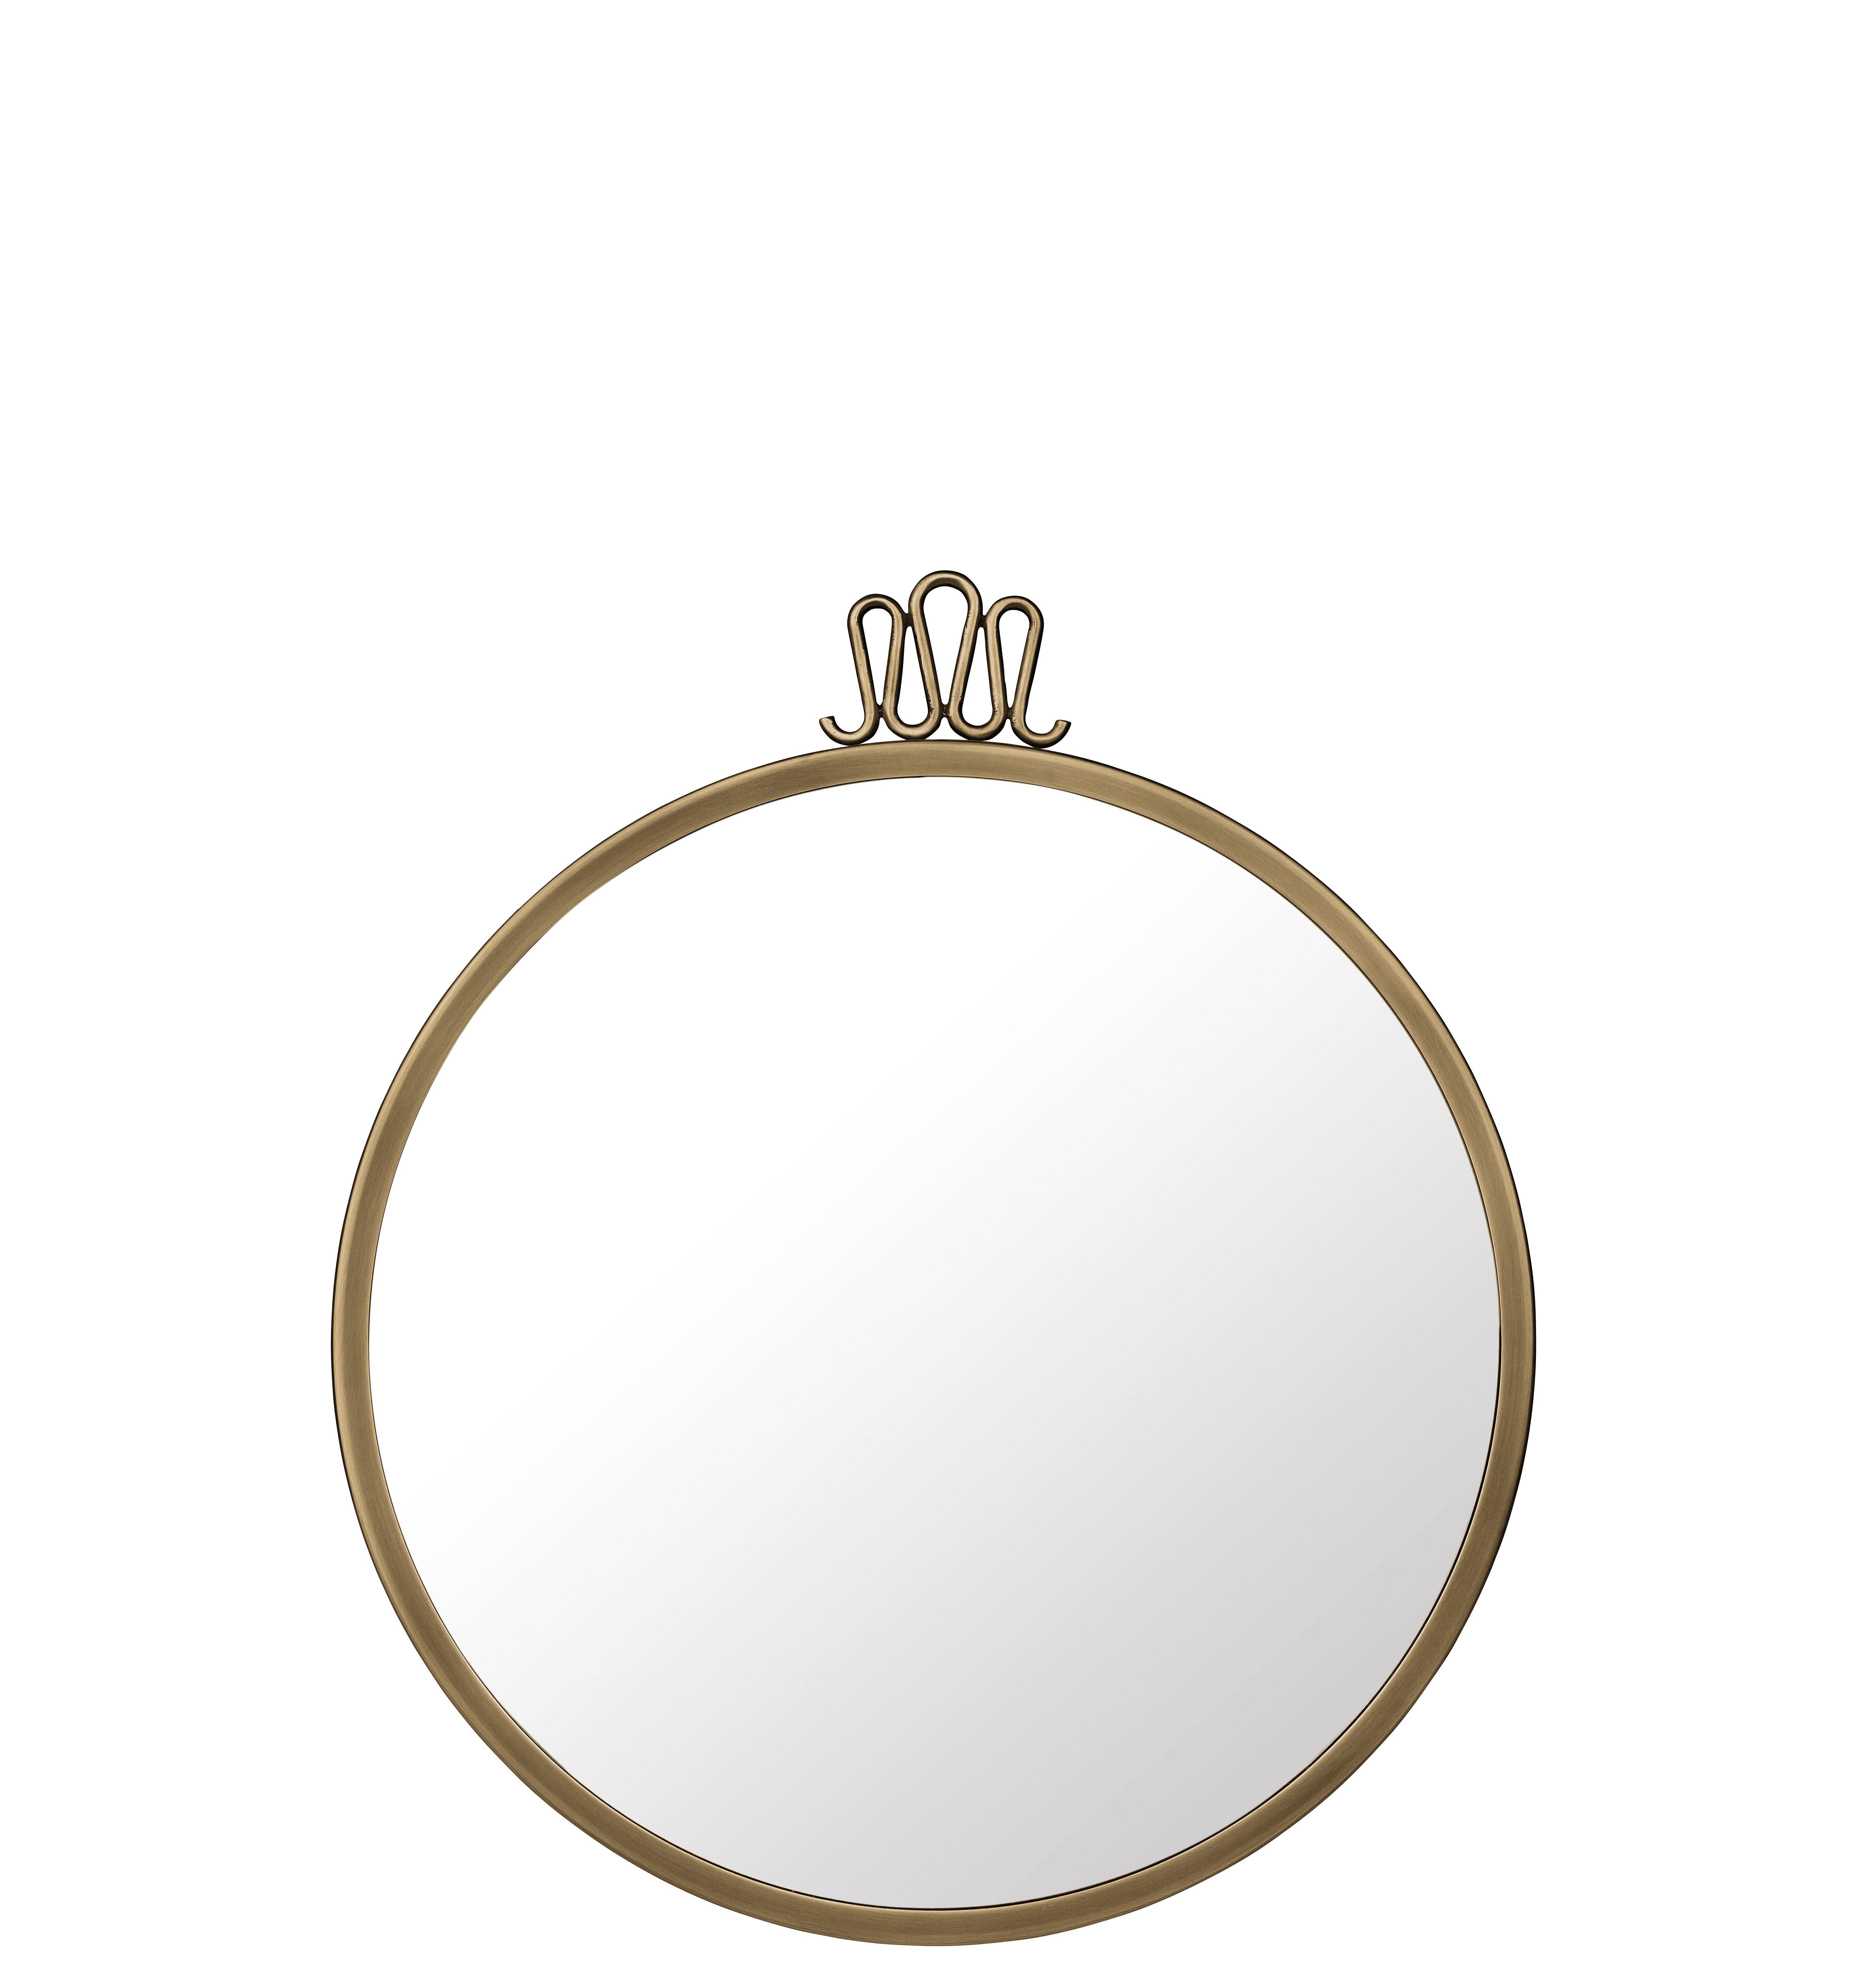 Decoration - Mirrors - Randaccio Wall mirror - Gio Ponti / Ø 42 cm - Brass by Gubi - Ø 42 cm / Brass - Brass